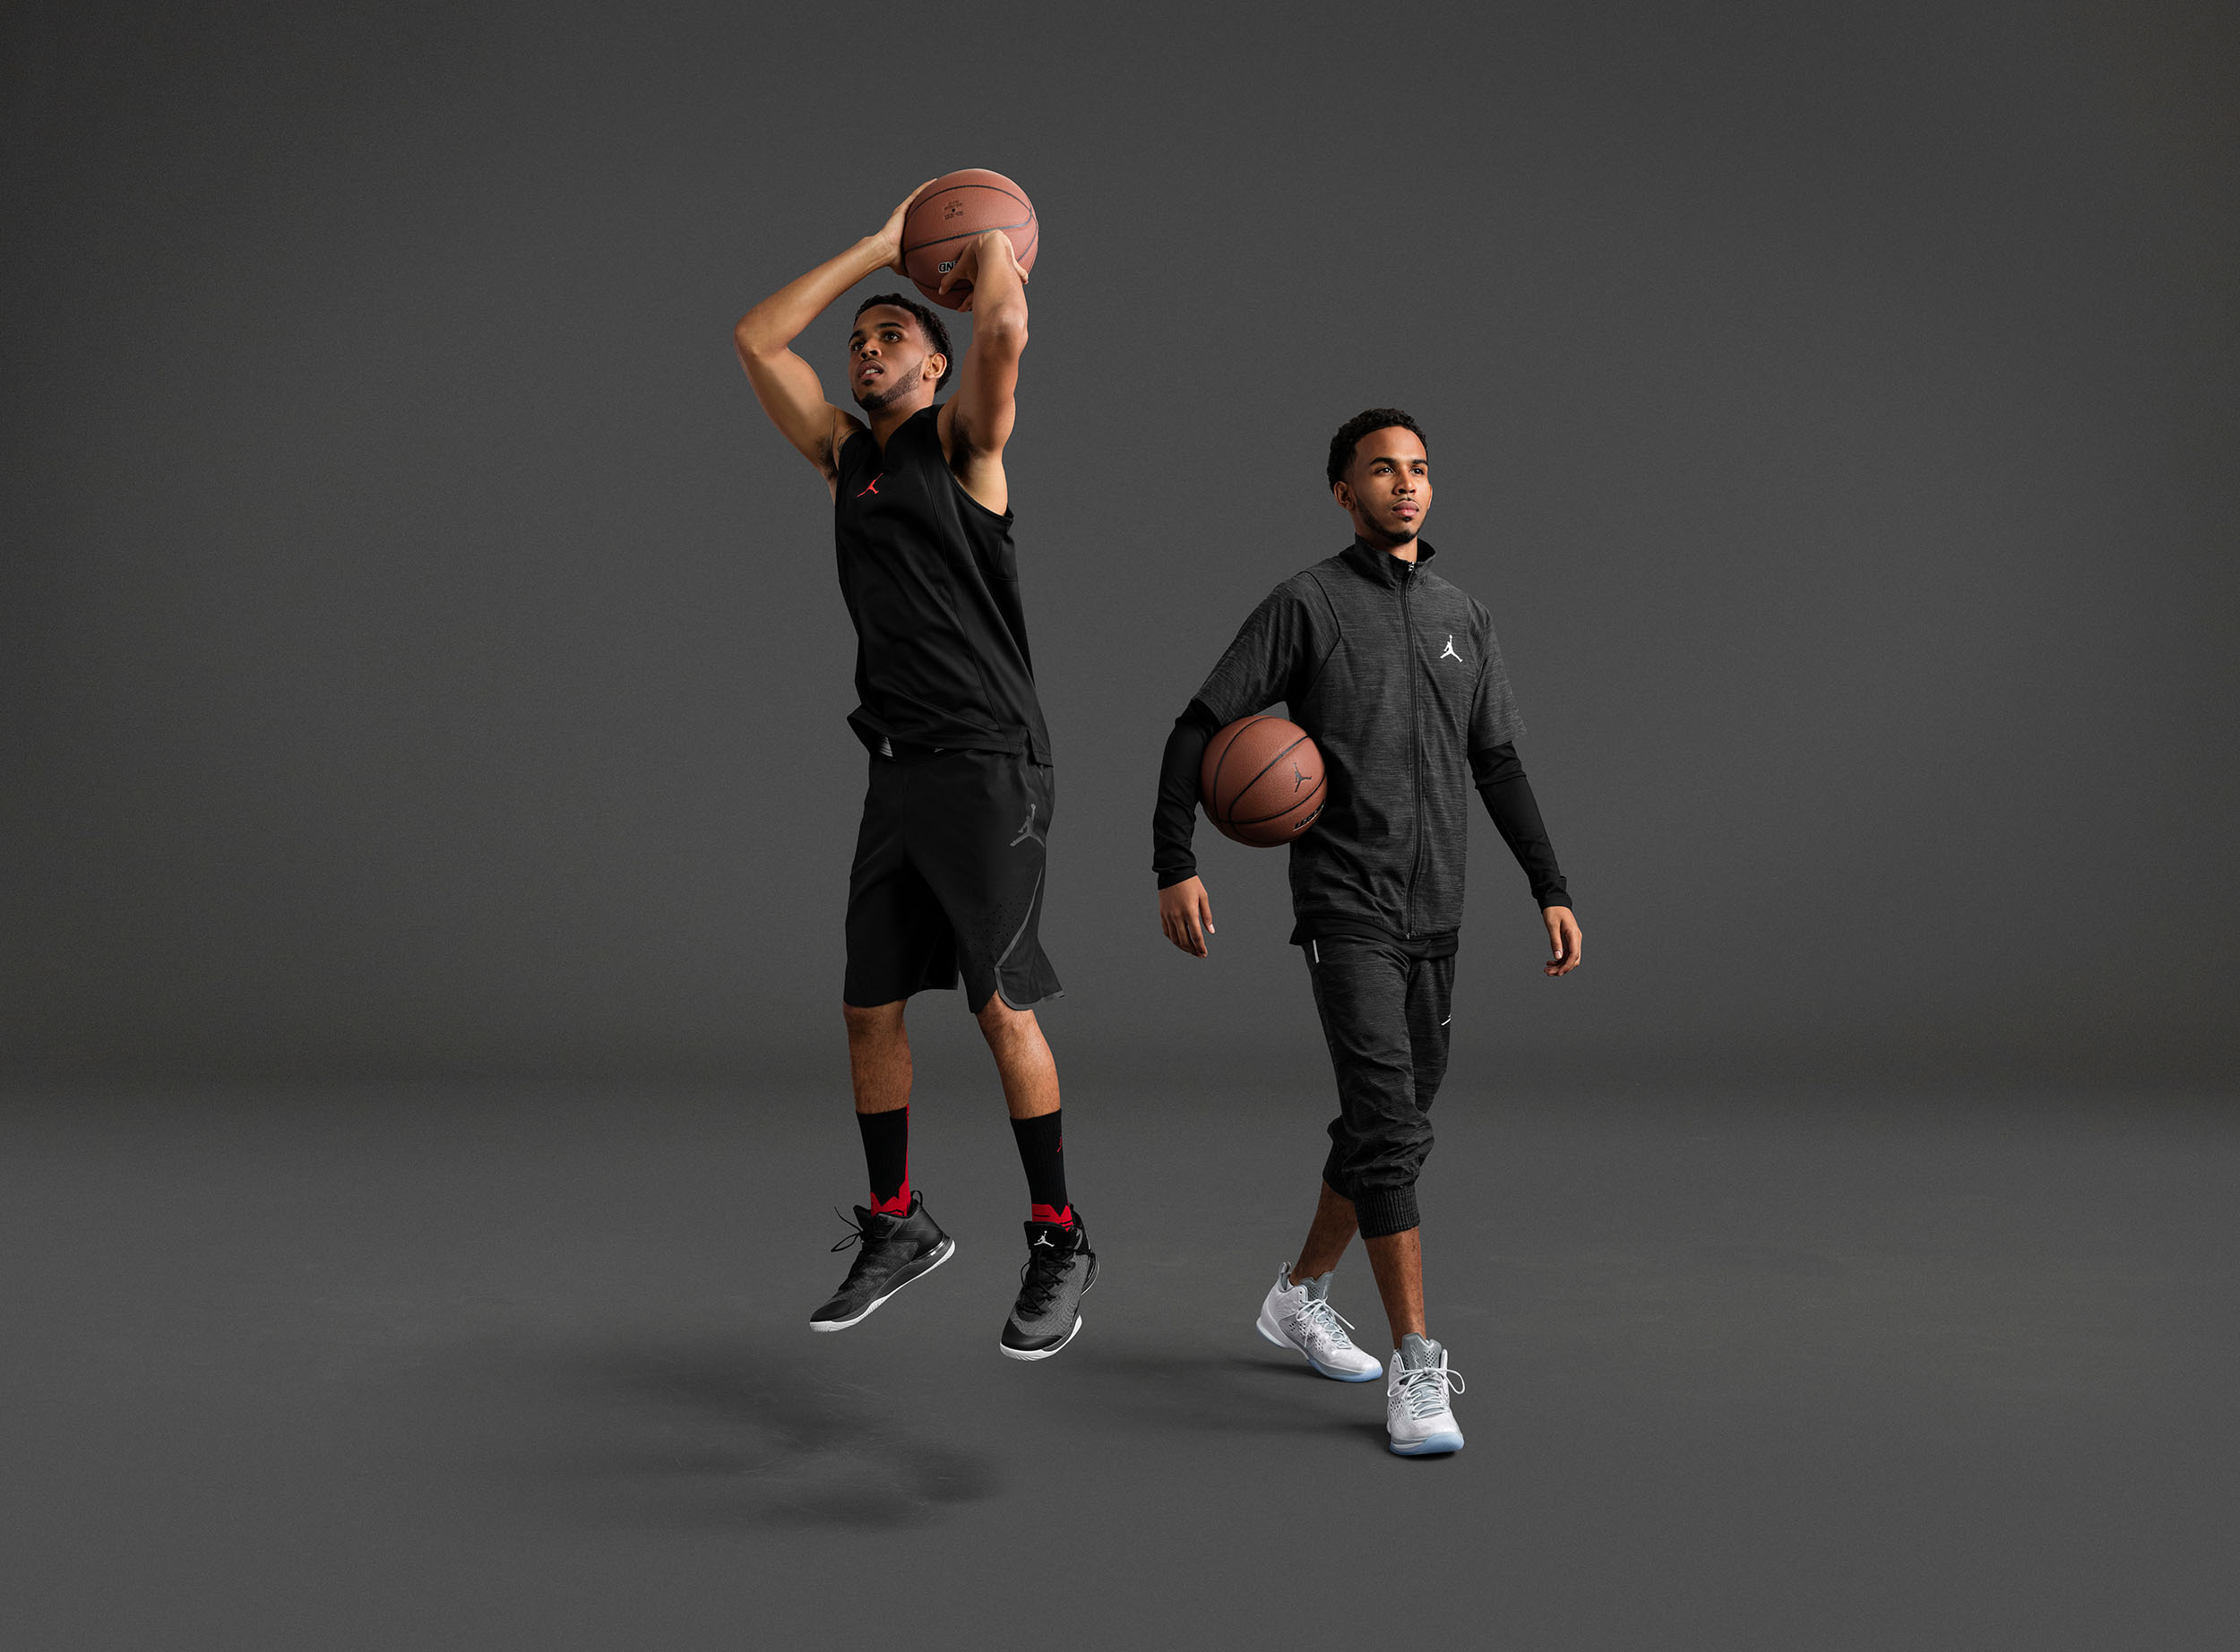 Brand_Jordan_Basketball_Layout_V2-AFTER.jpg